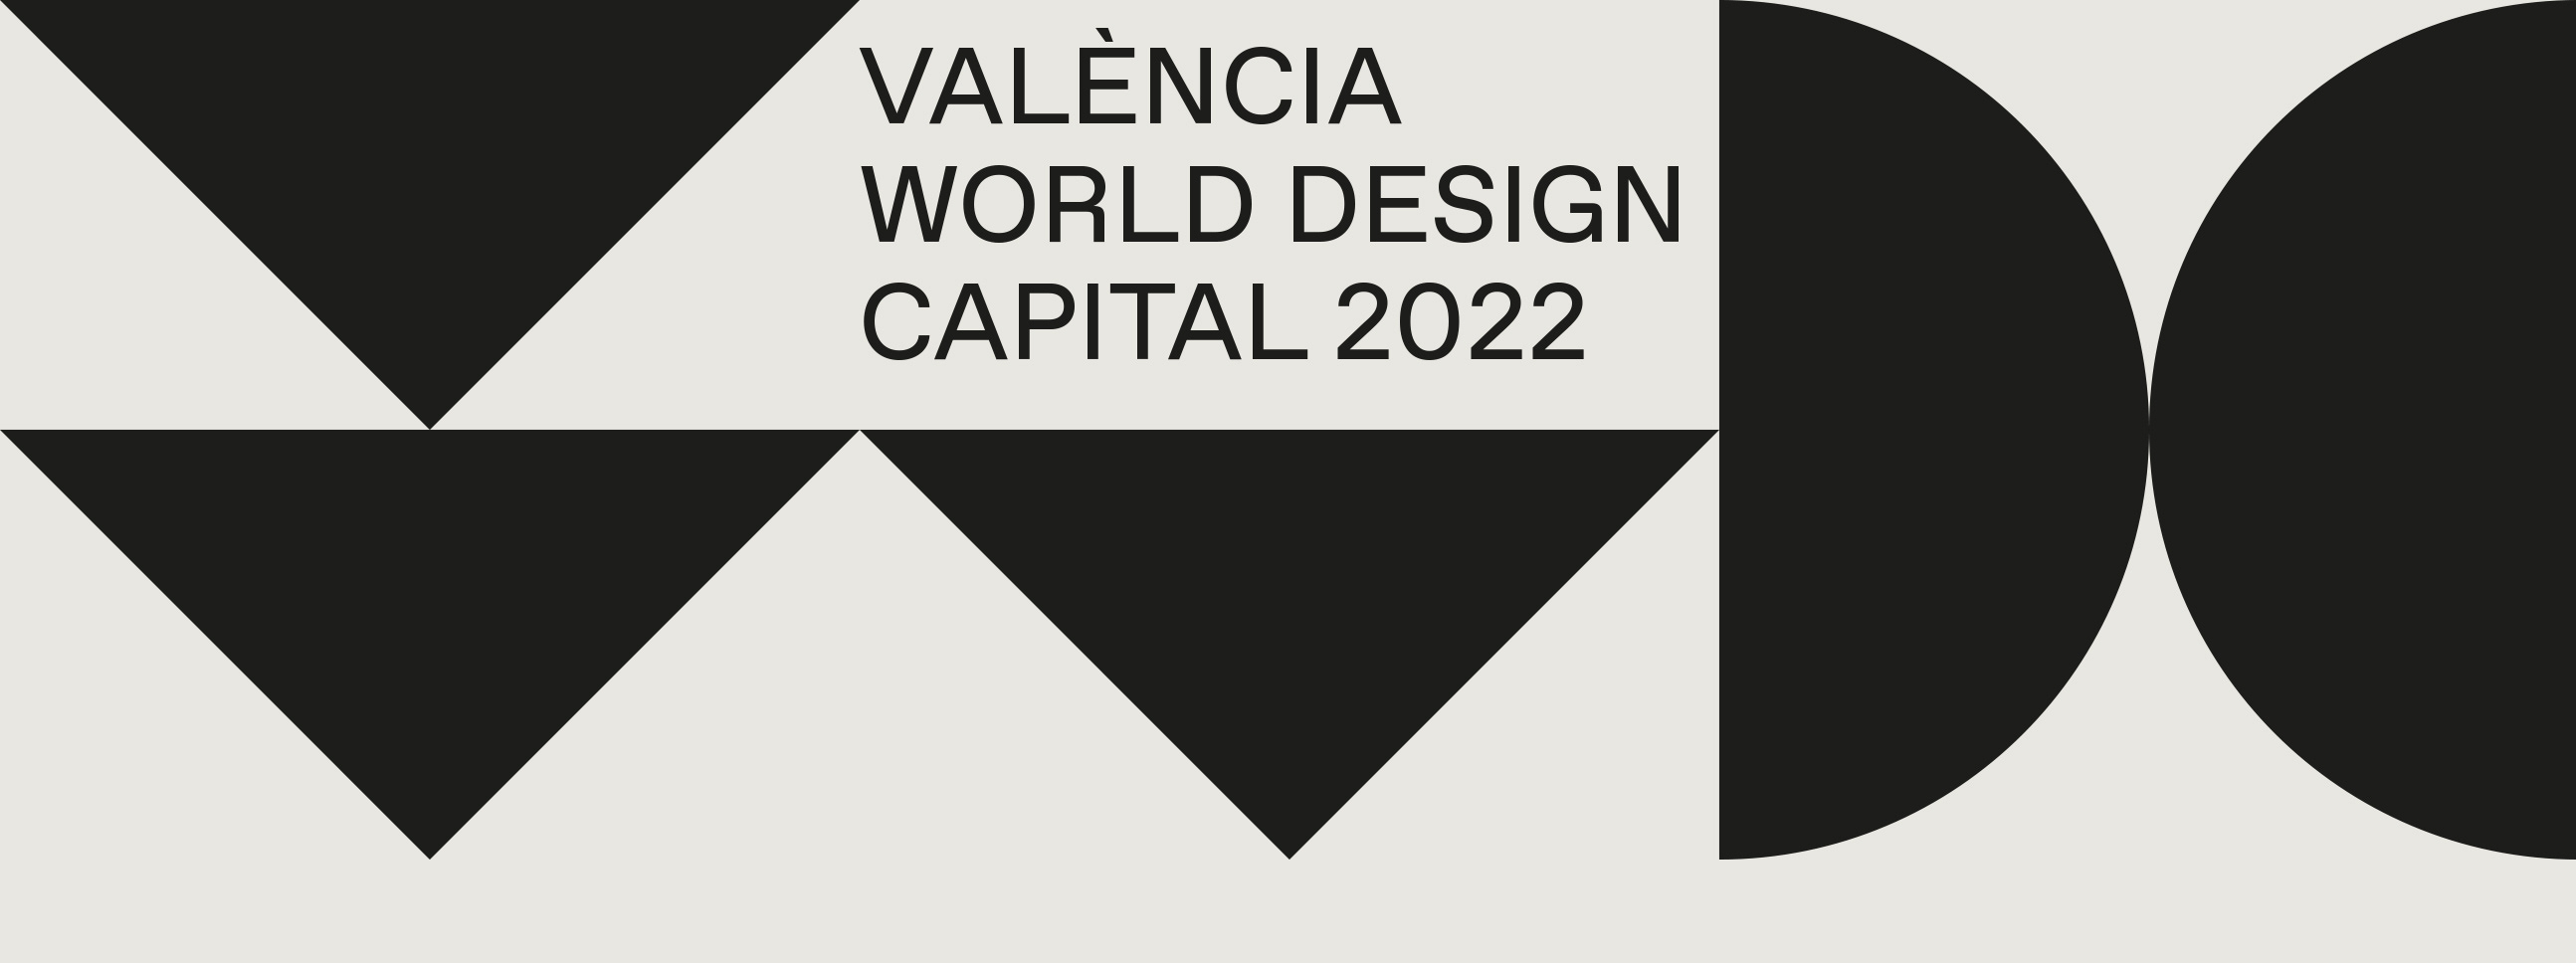 Resultado de imagen de world design capital valencia